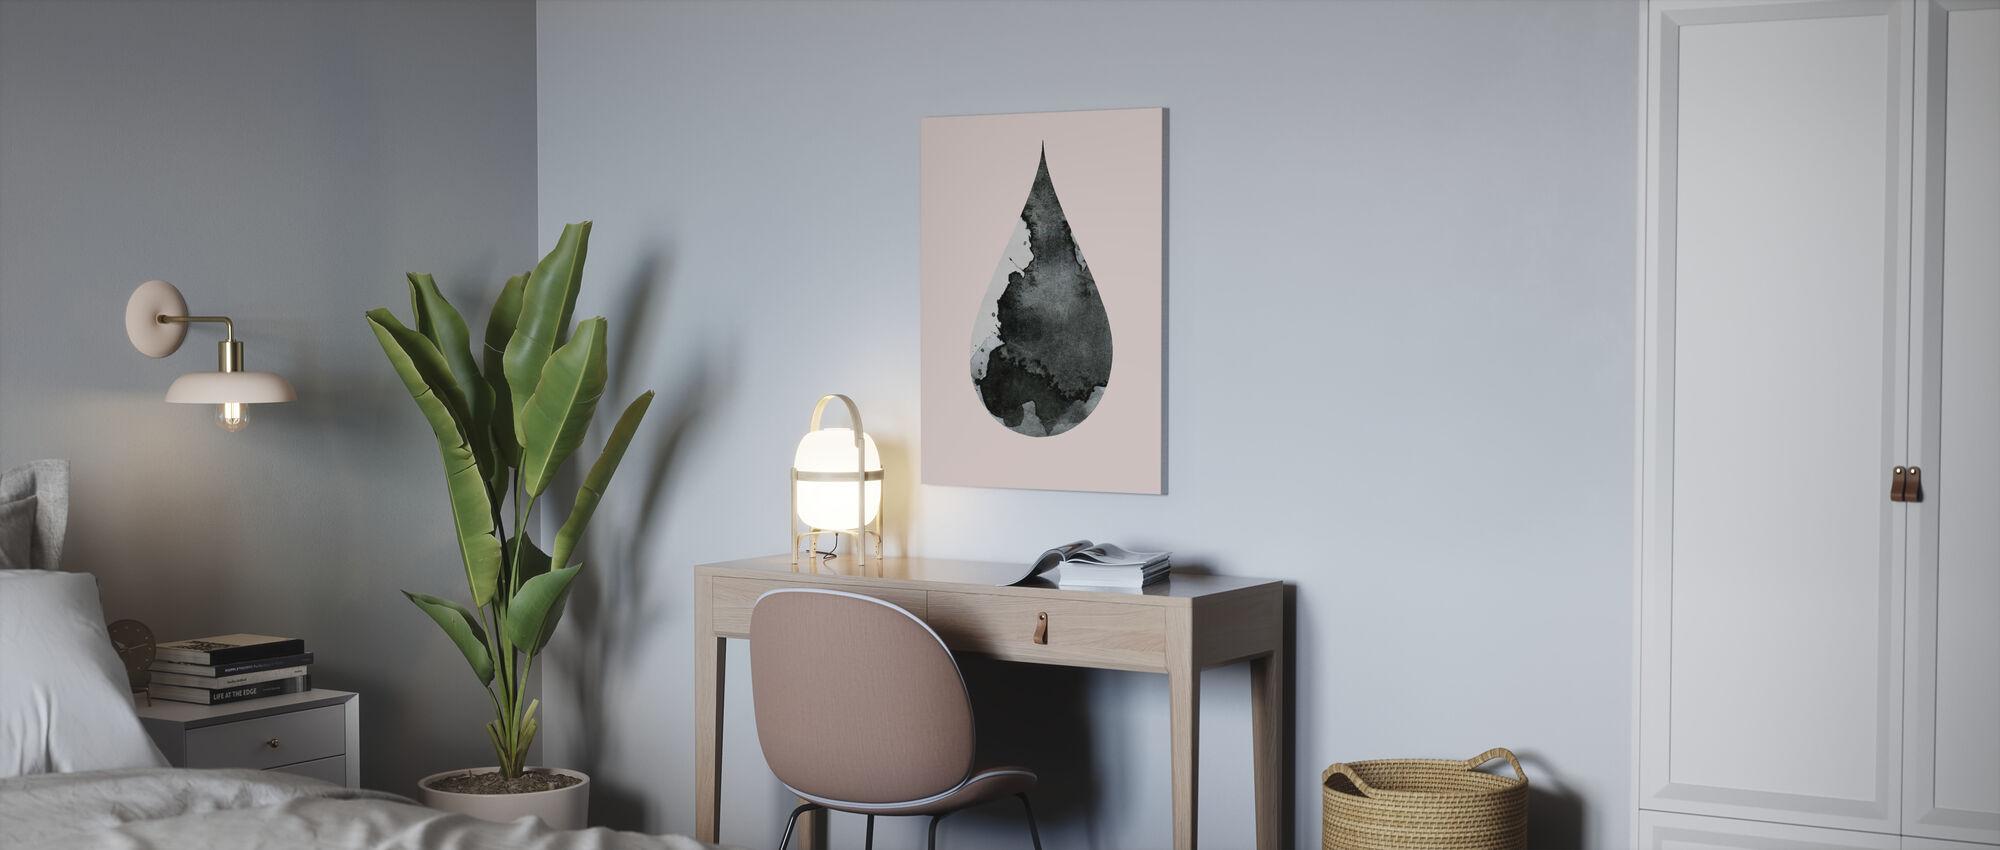 Drop No 4 - Canvas print - Office